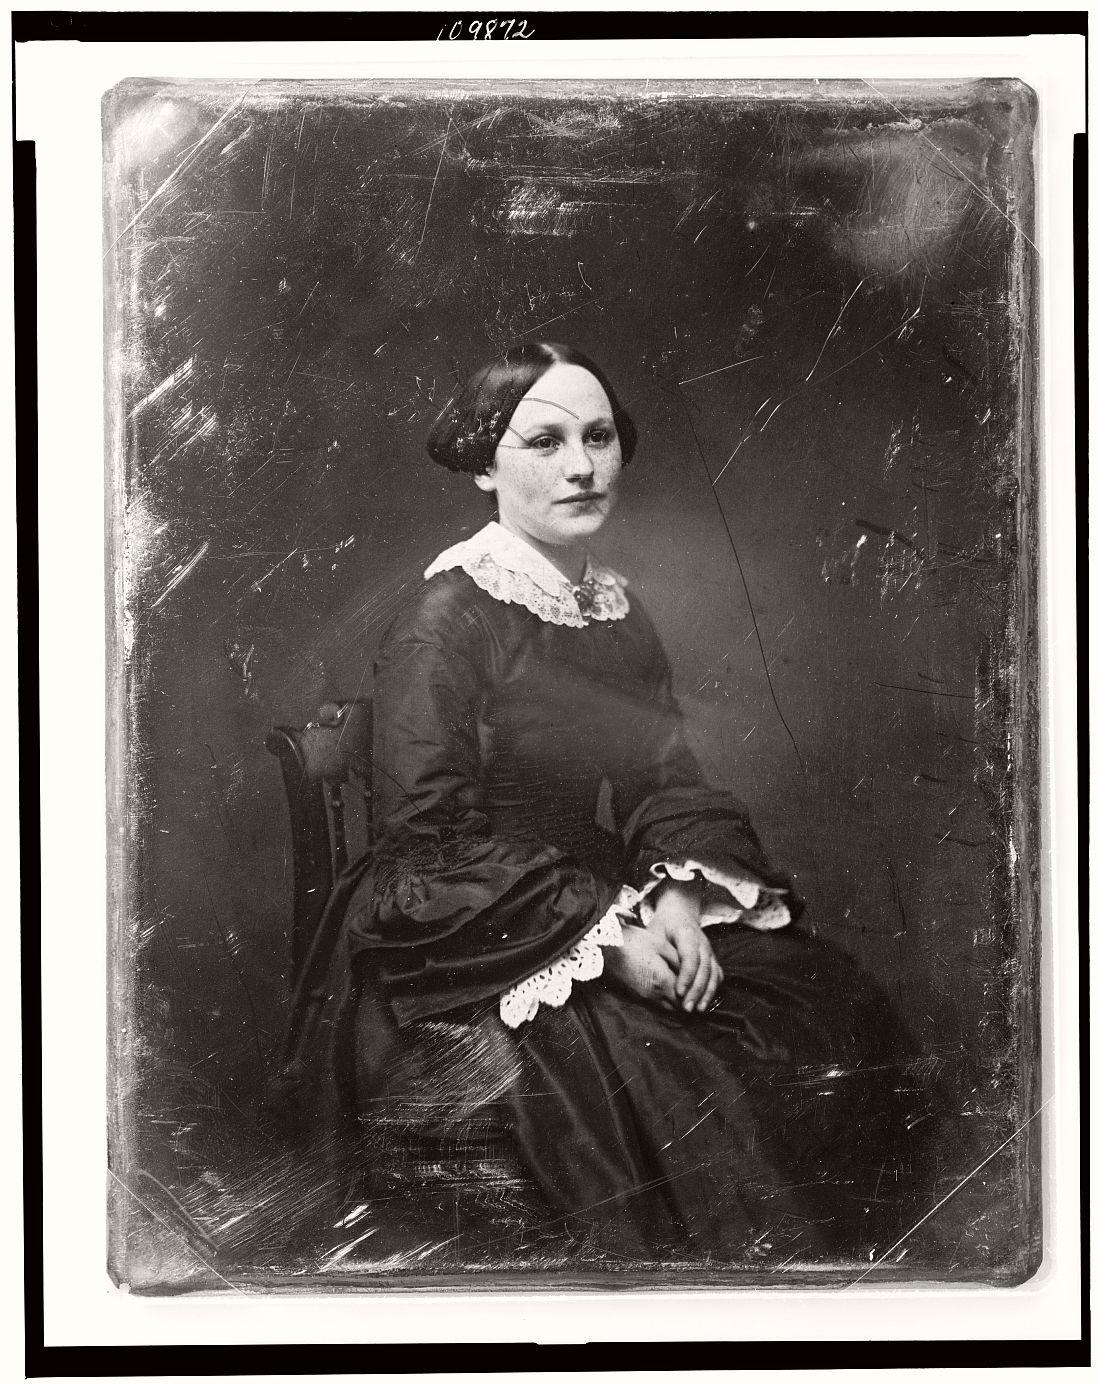 vintage-daguerreotype-portraits-from-xix-century-1844-1860-12